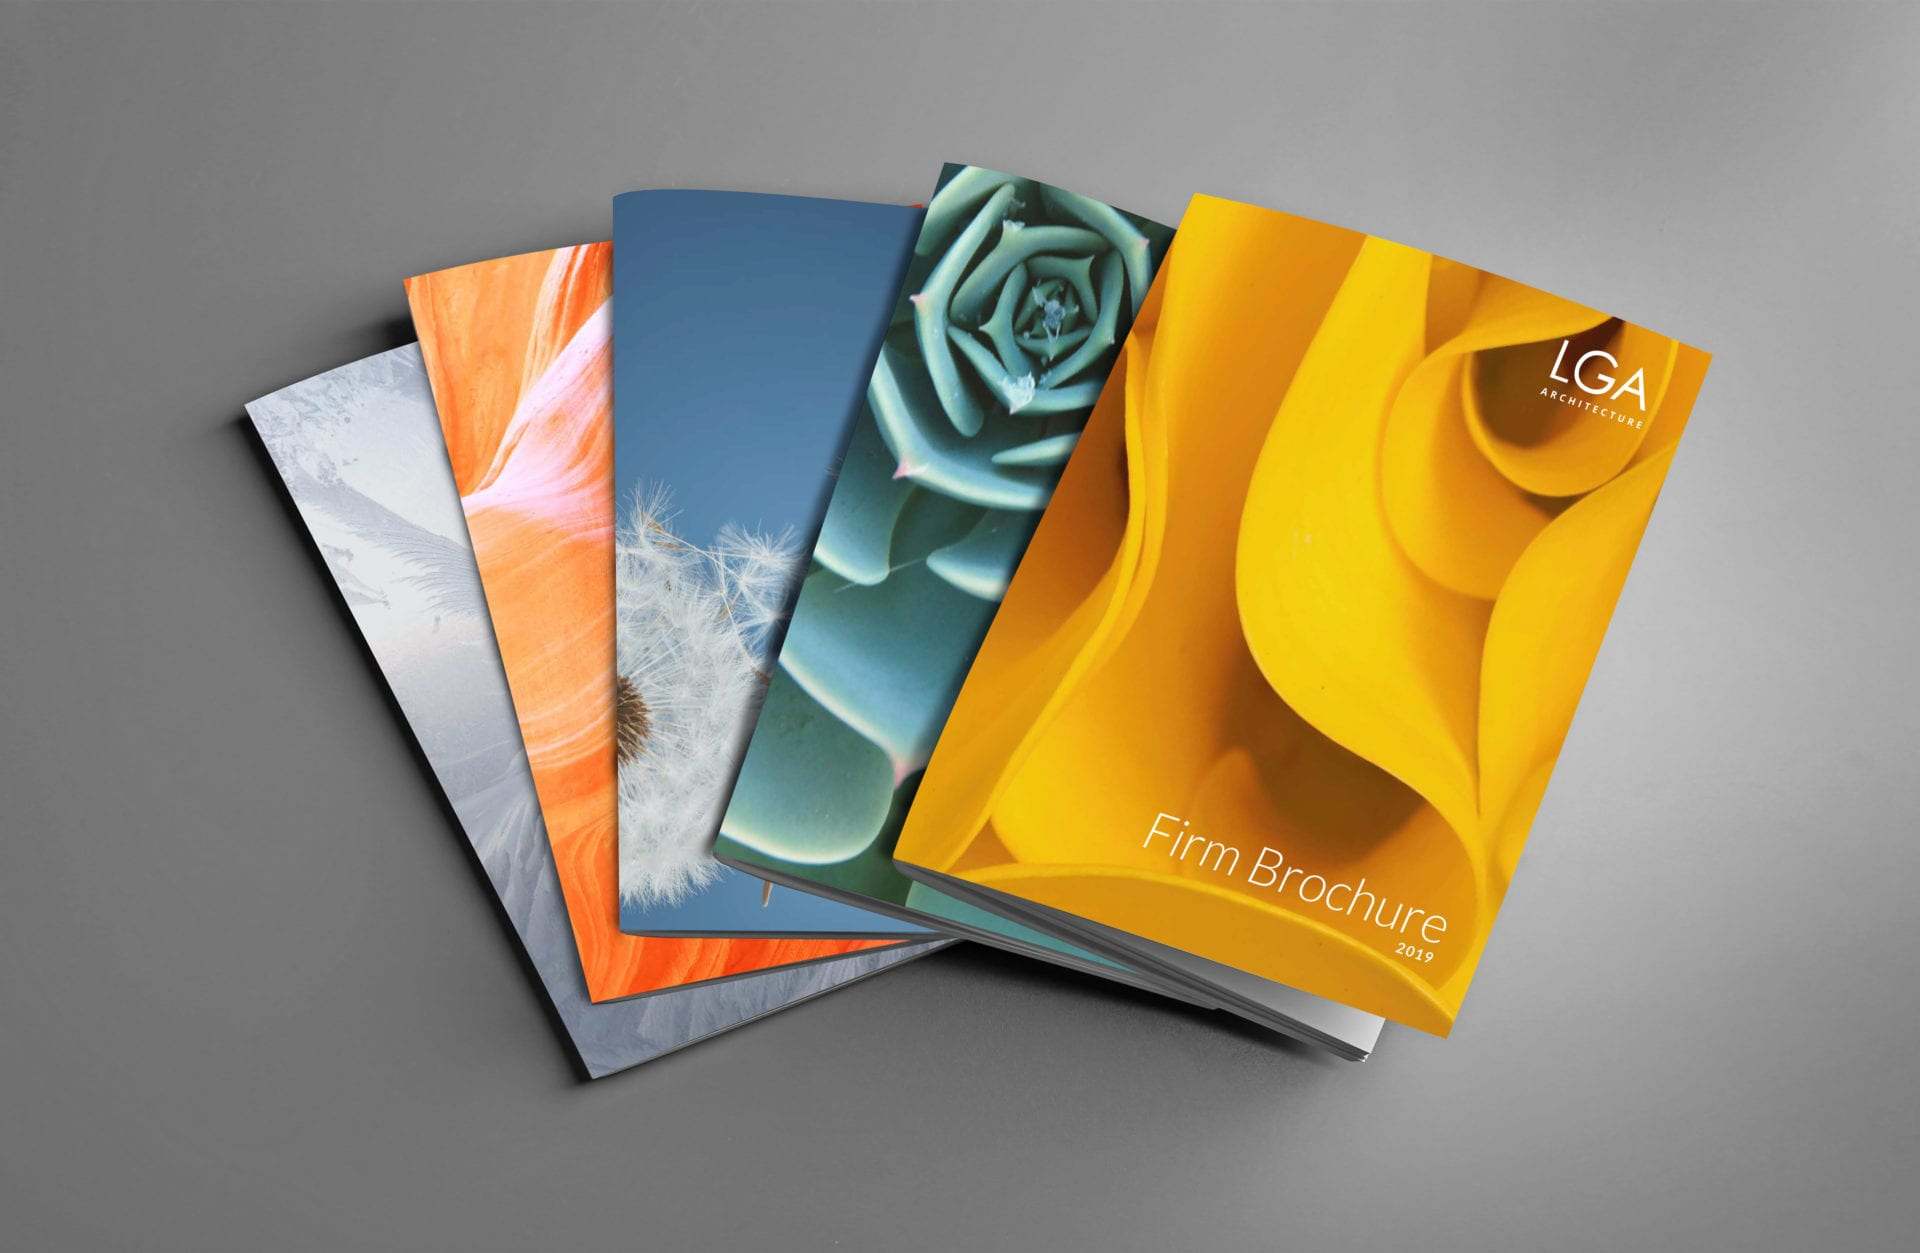 LGA Architecture firm brochures